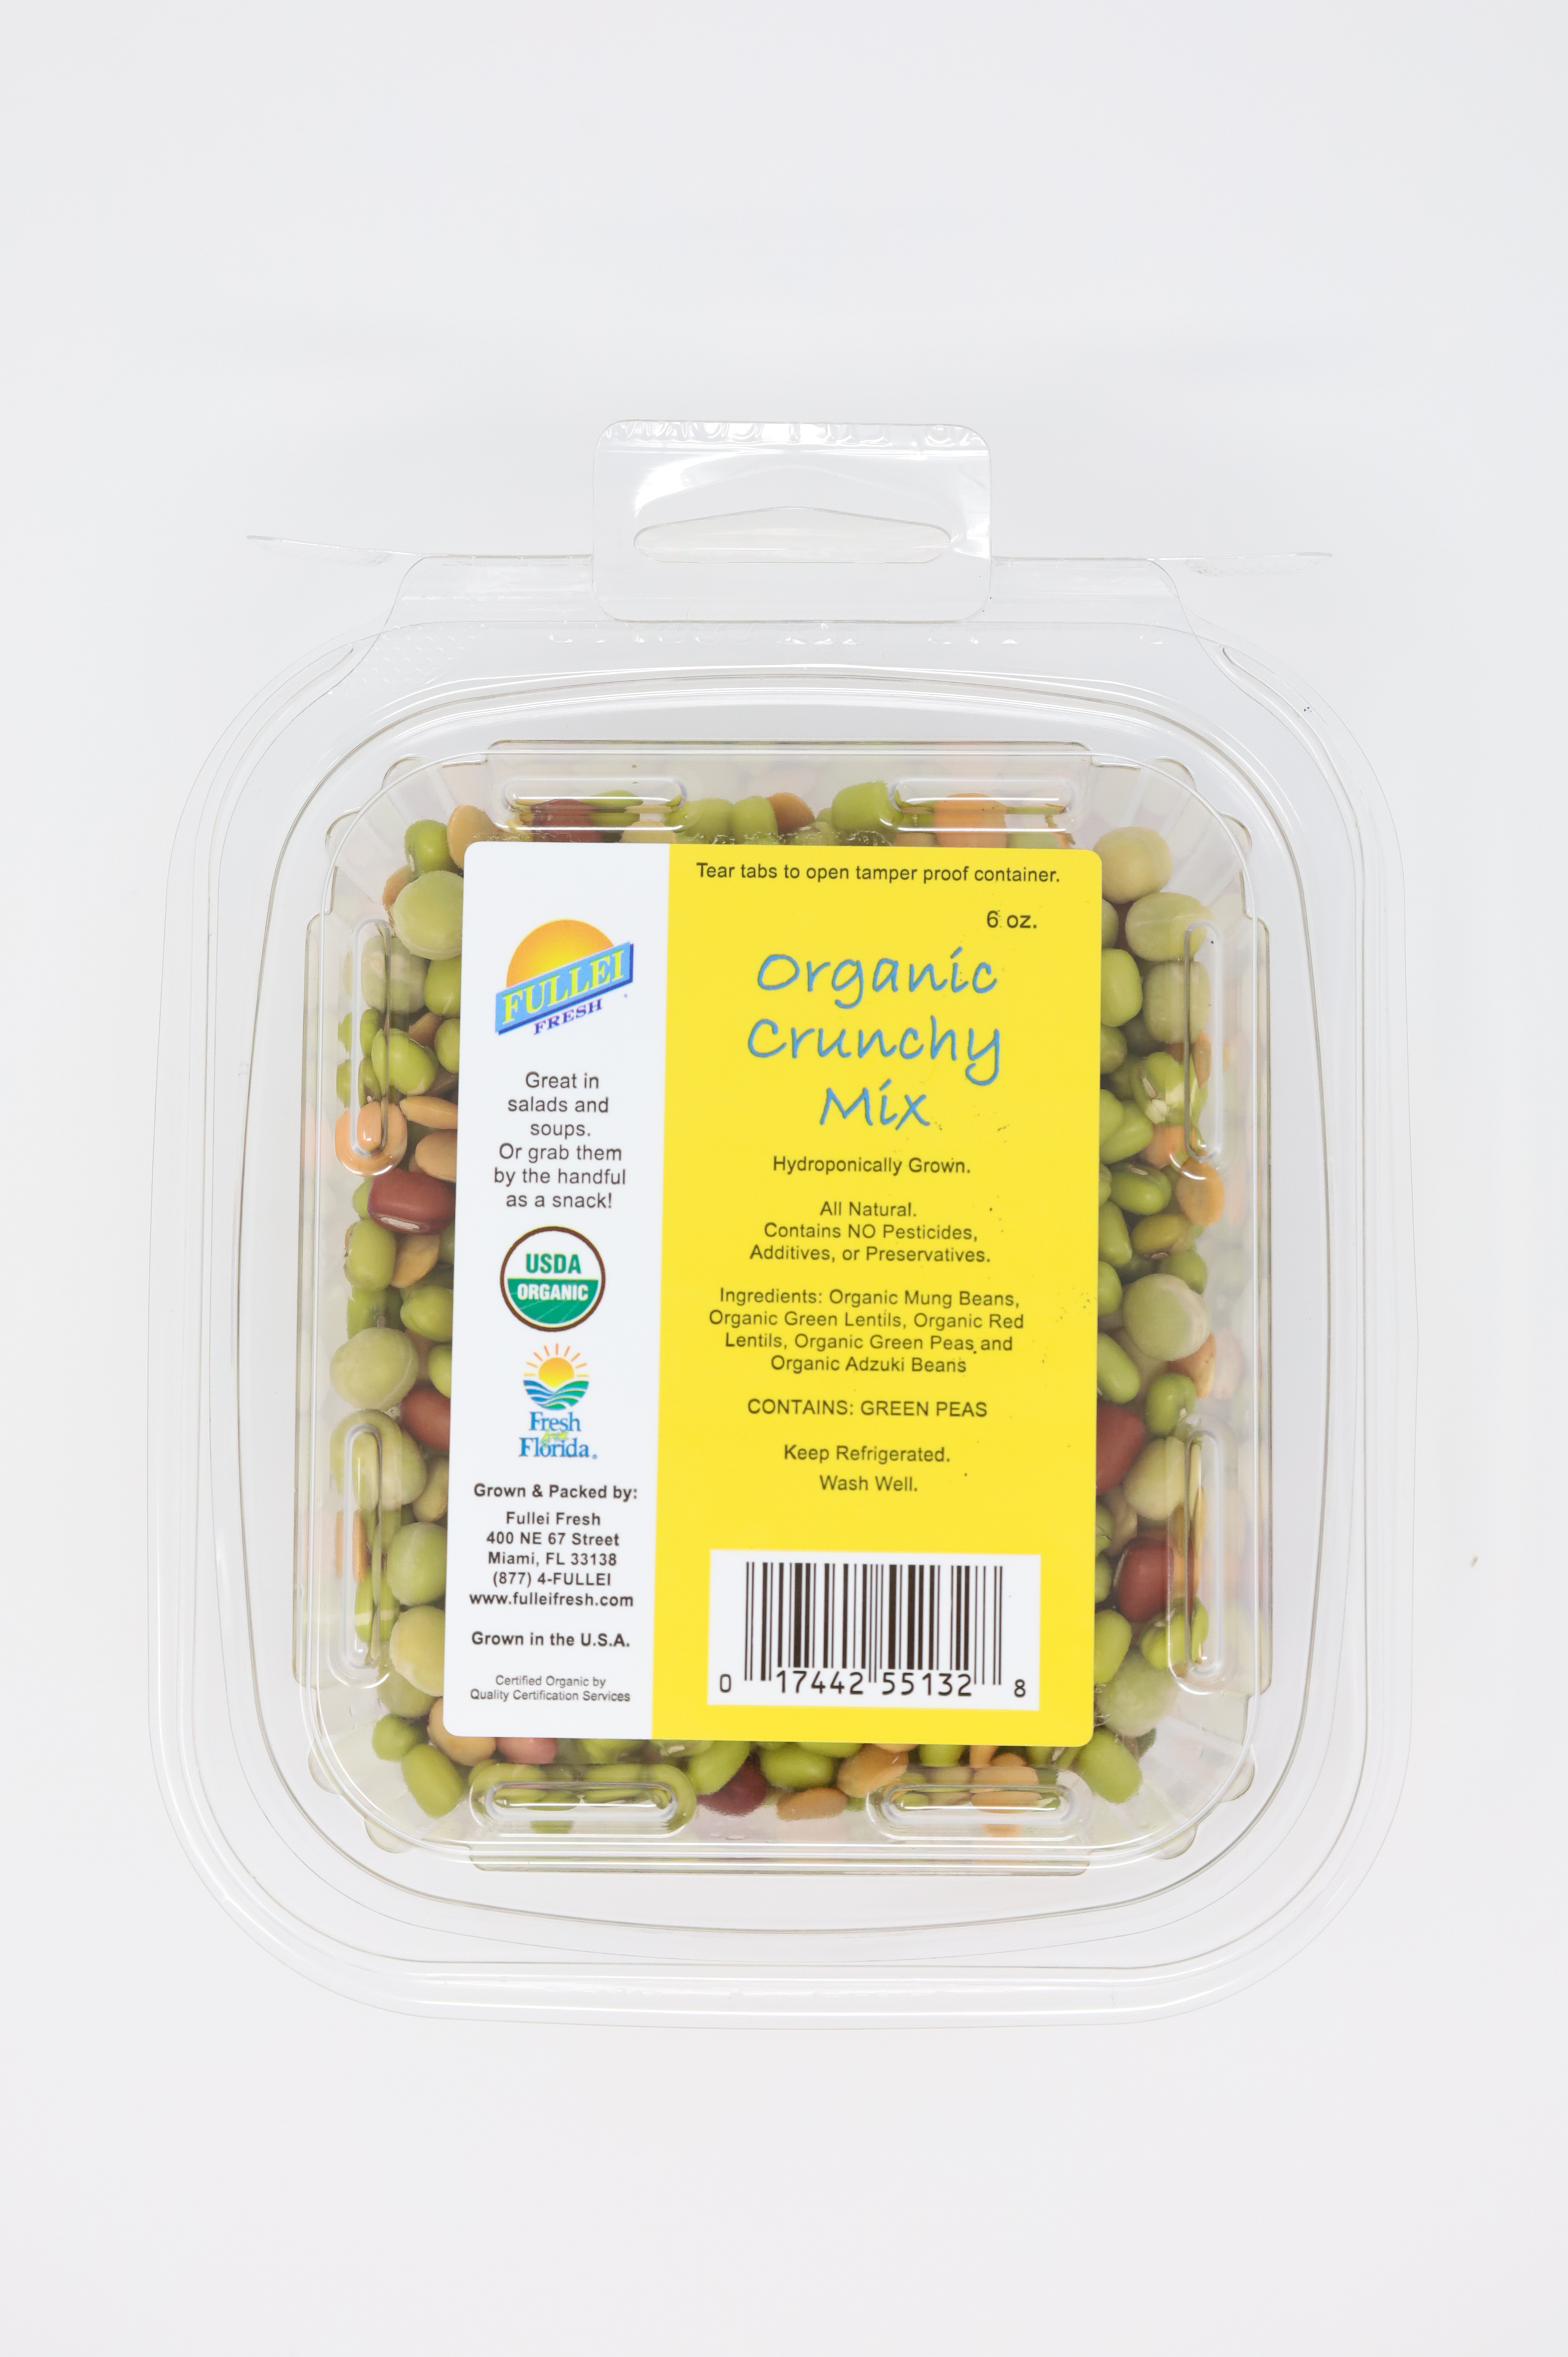 Organic Crunchy Mix